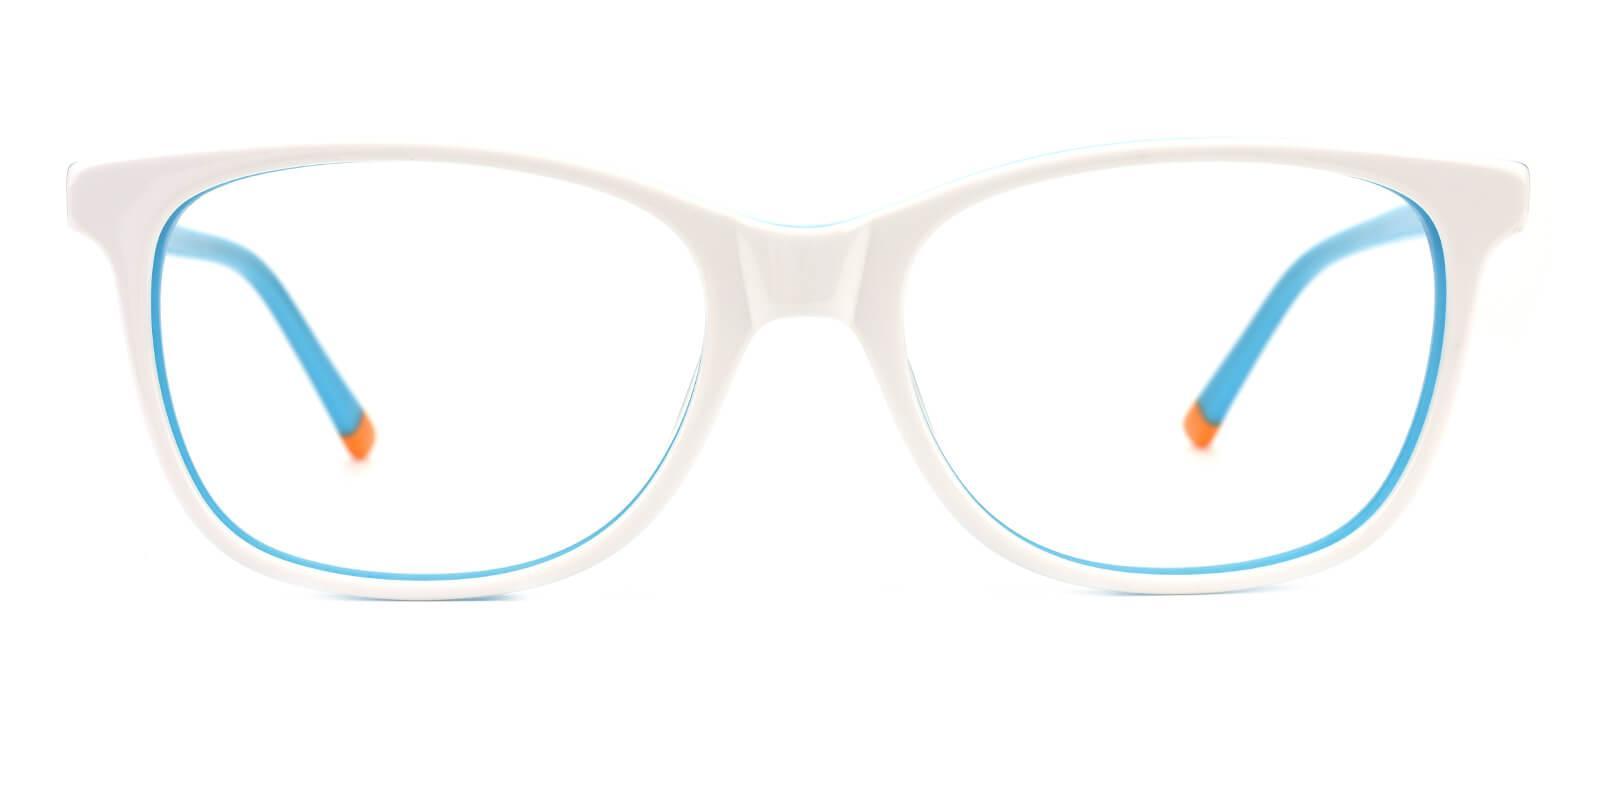 Sandwich-White-Square-Acetate-Eyeglasses-additional2